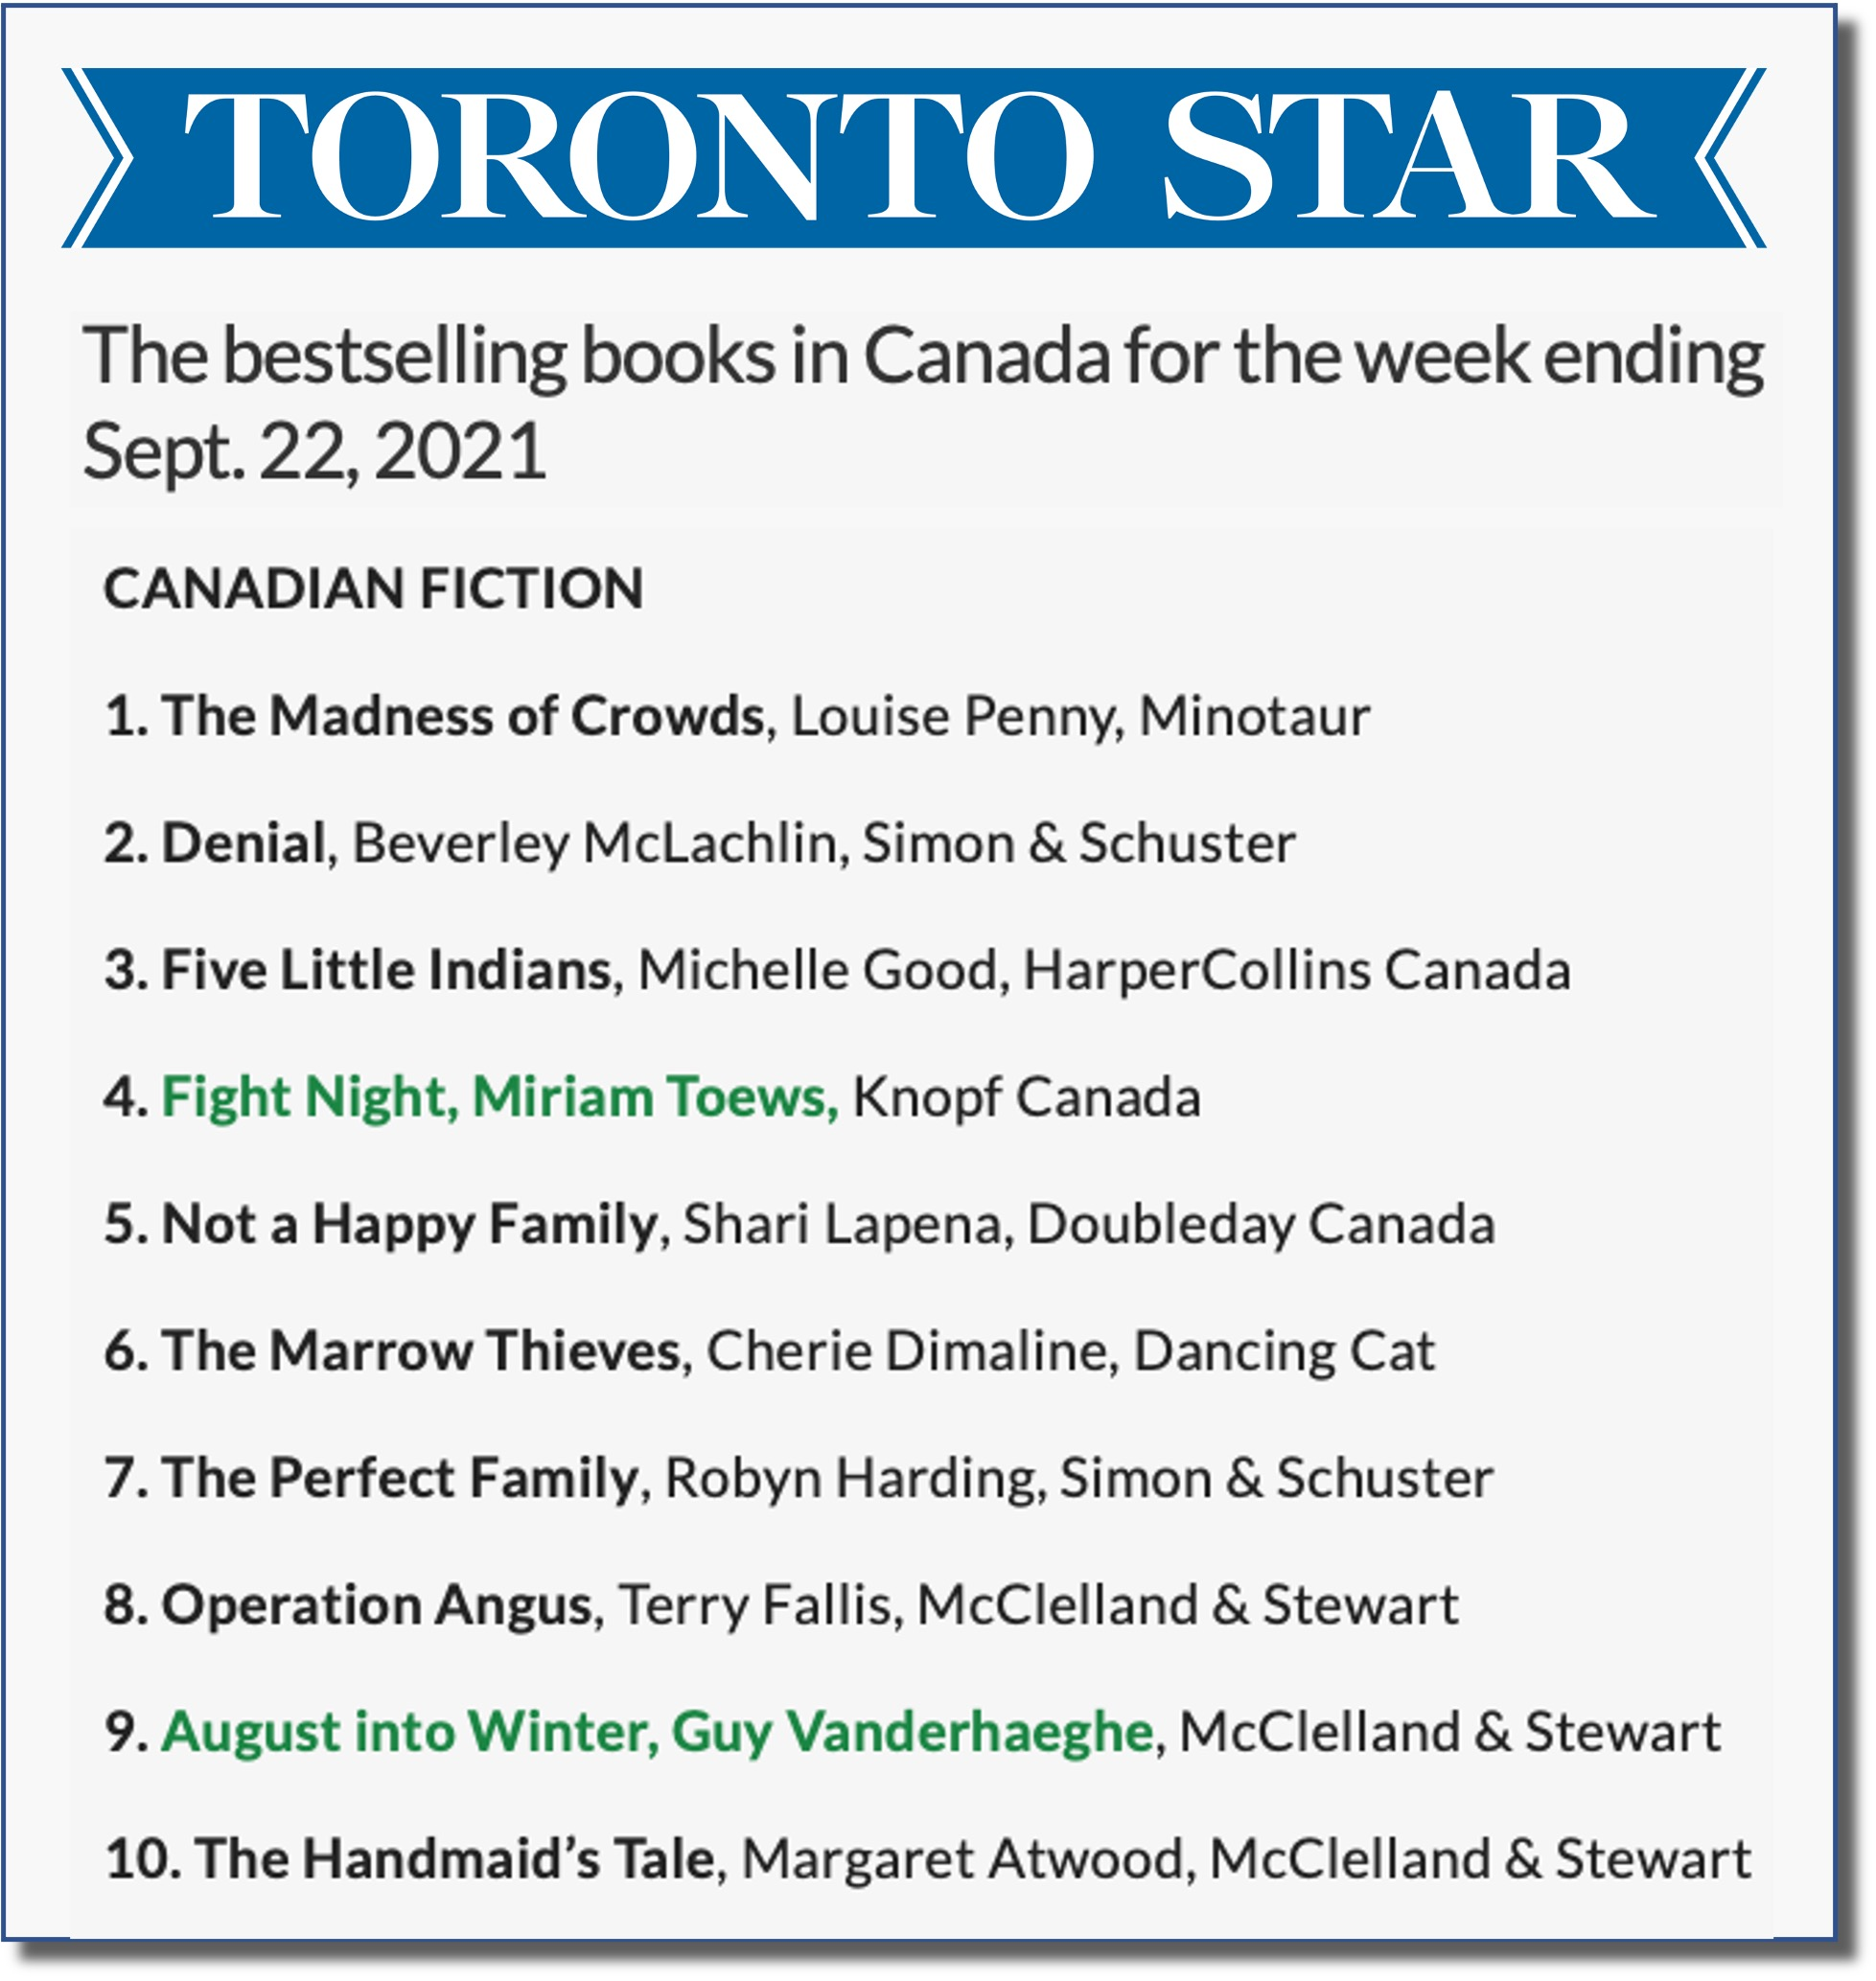 Toronto Star Sept 22